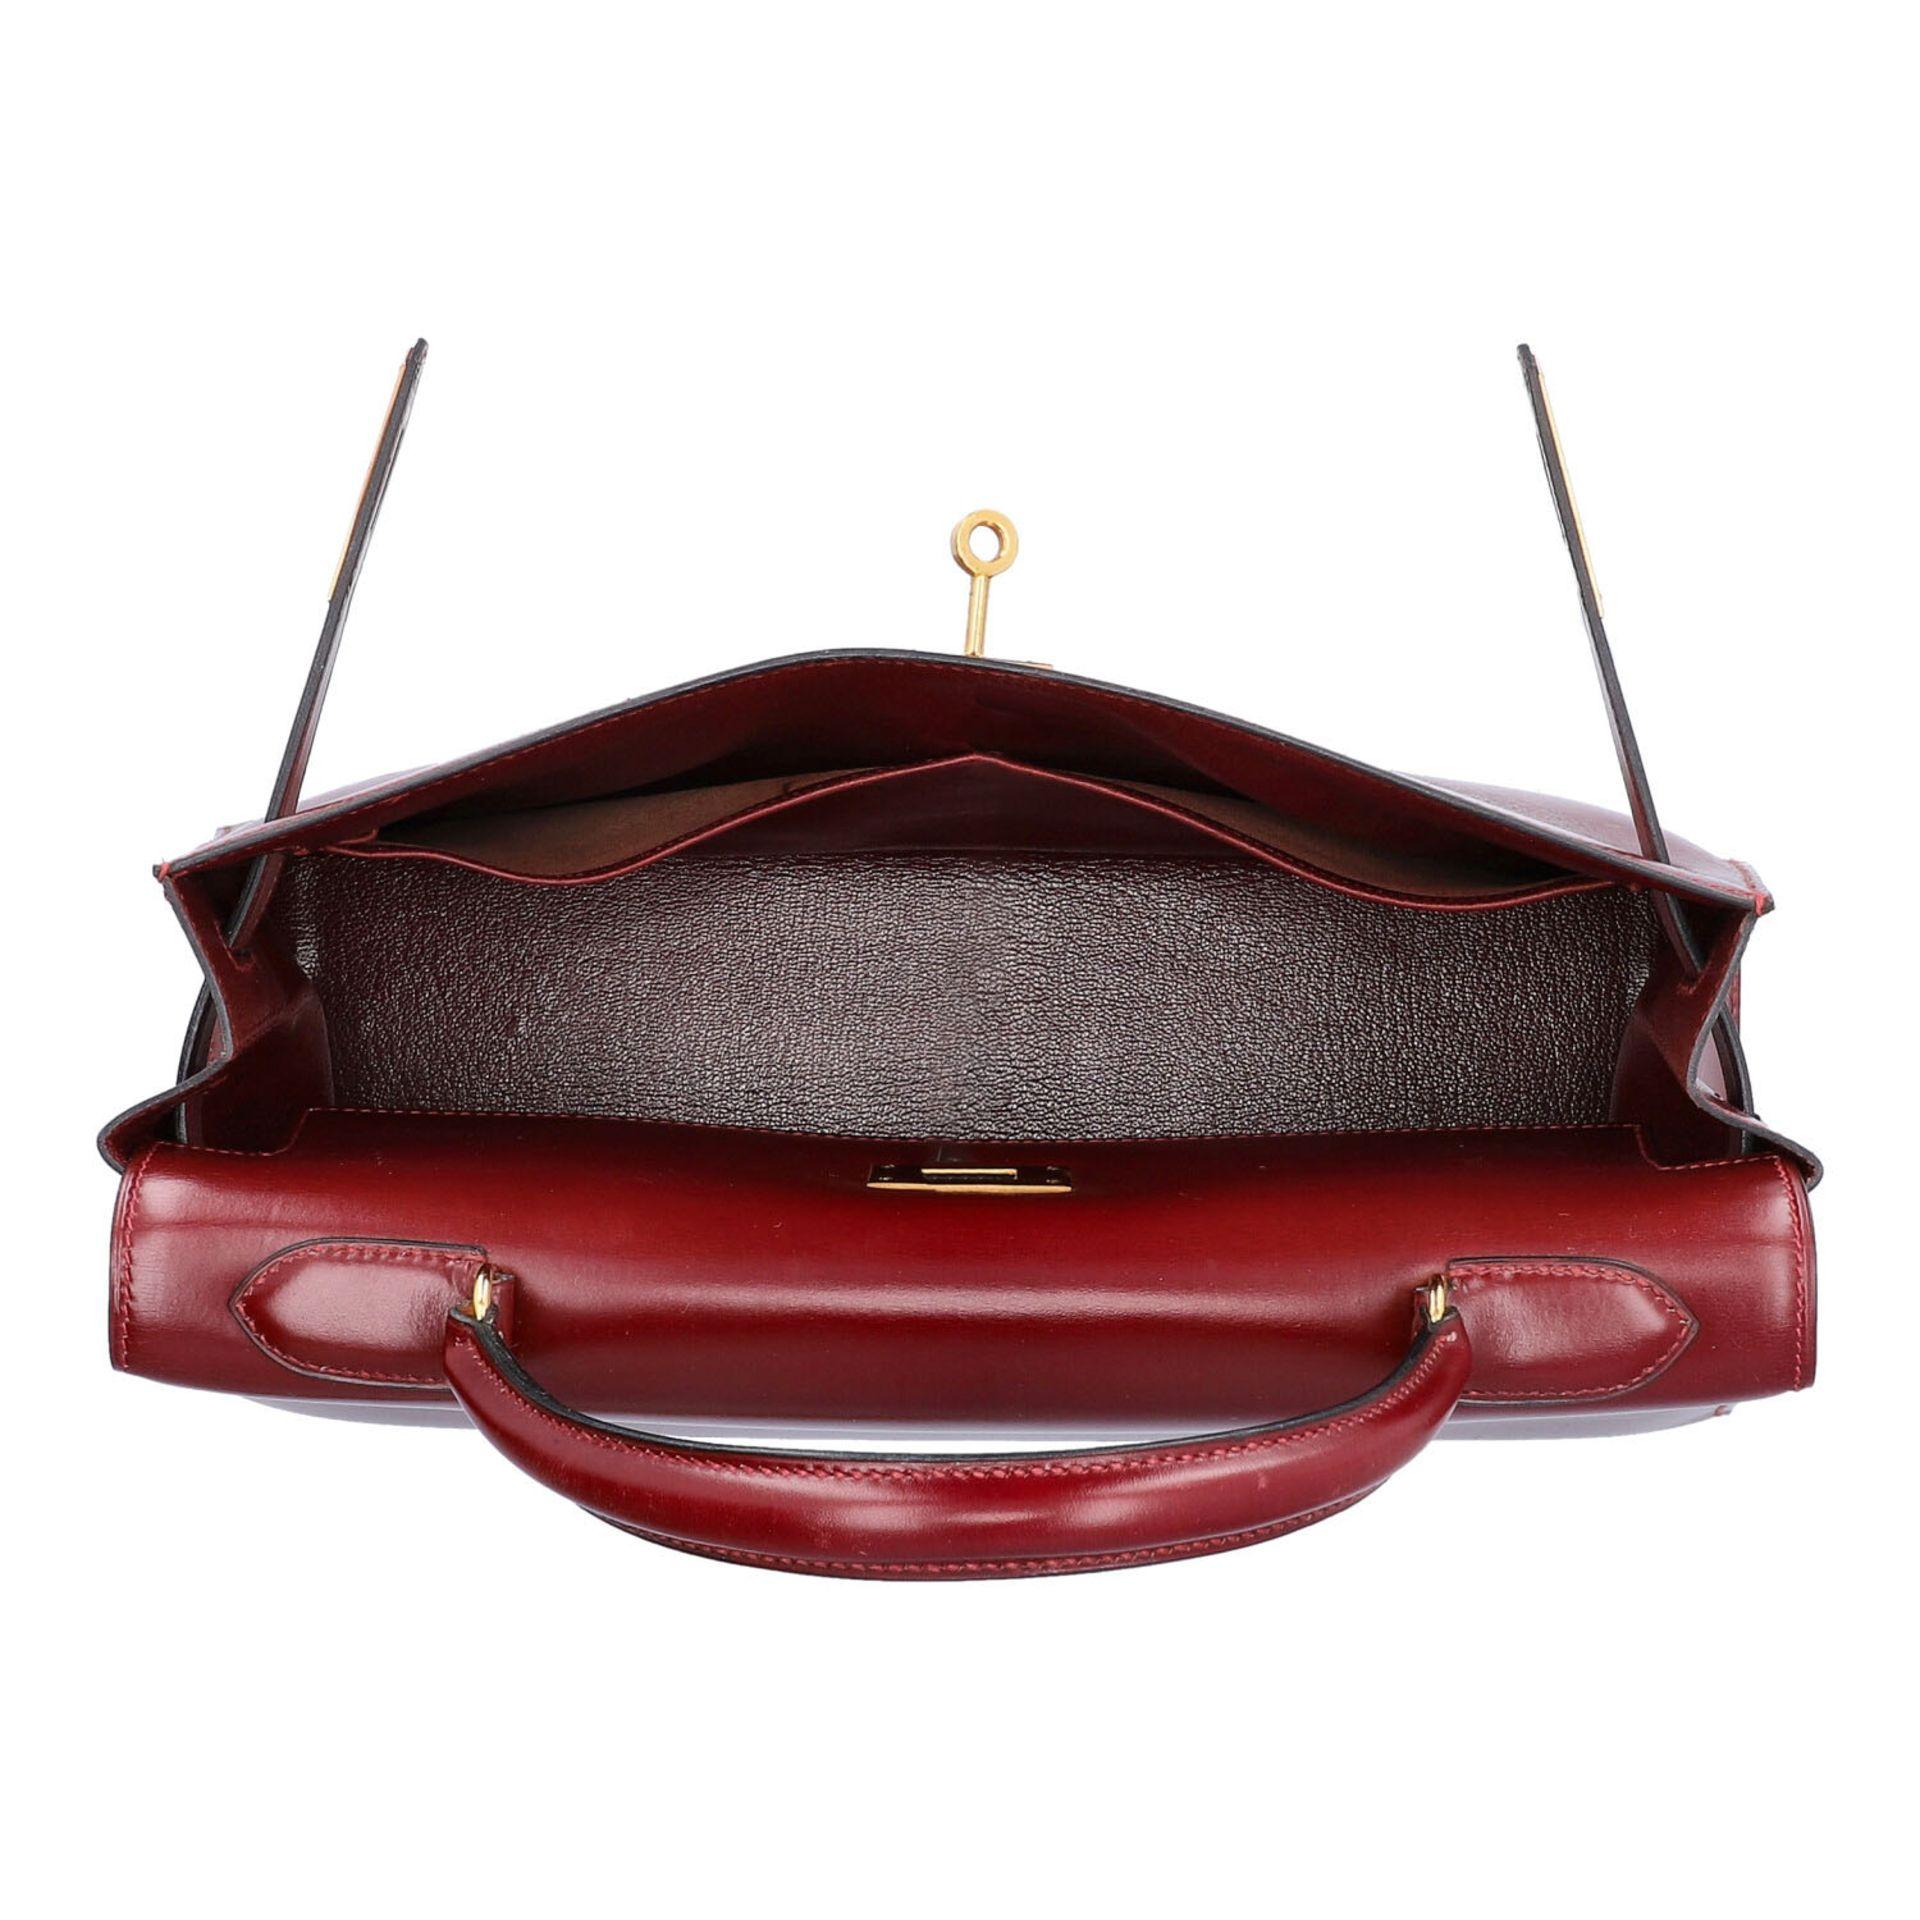 "HERMÈS VINTAGE Handtasche ""KELLY BAG 32"". Koll. 1980. NP. ca.: 8.000,-€. Boxcalf Le - Image 6 of 9"